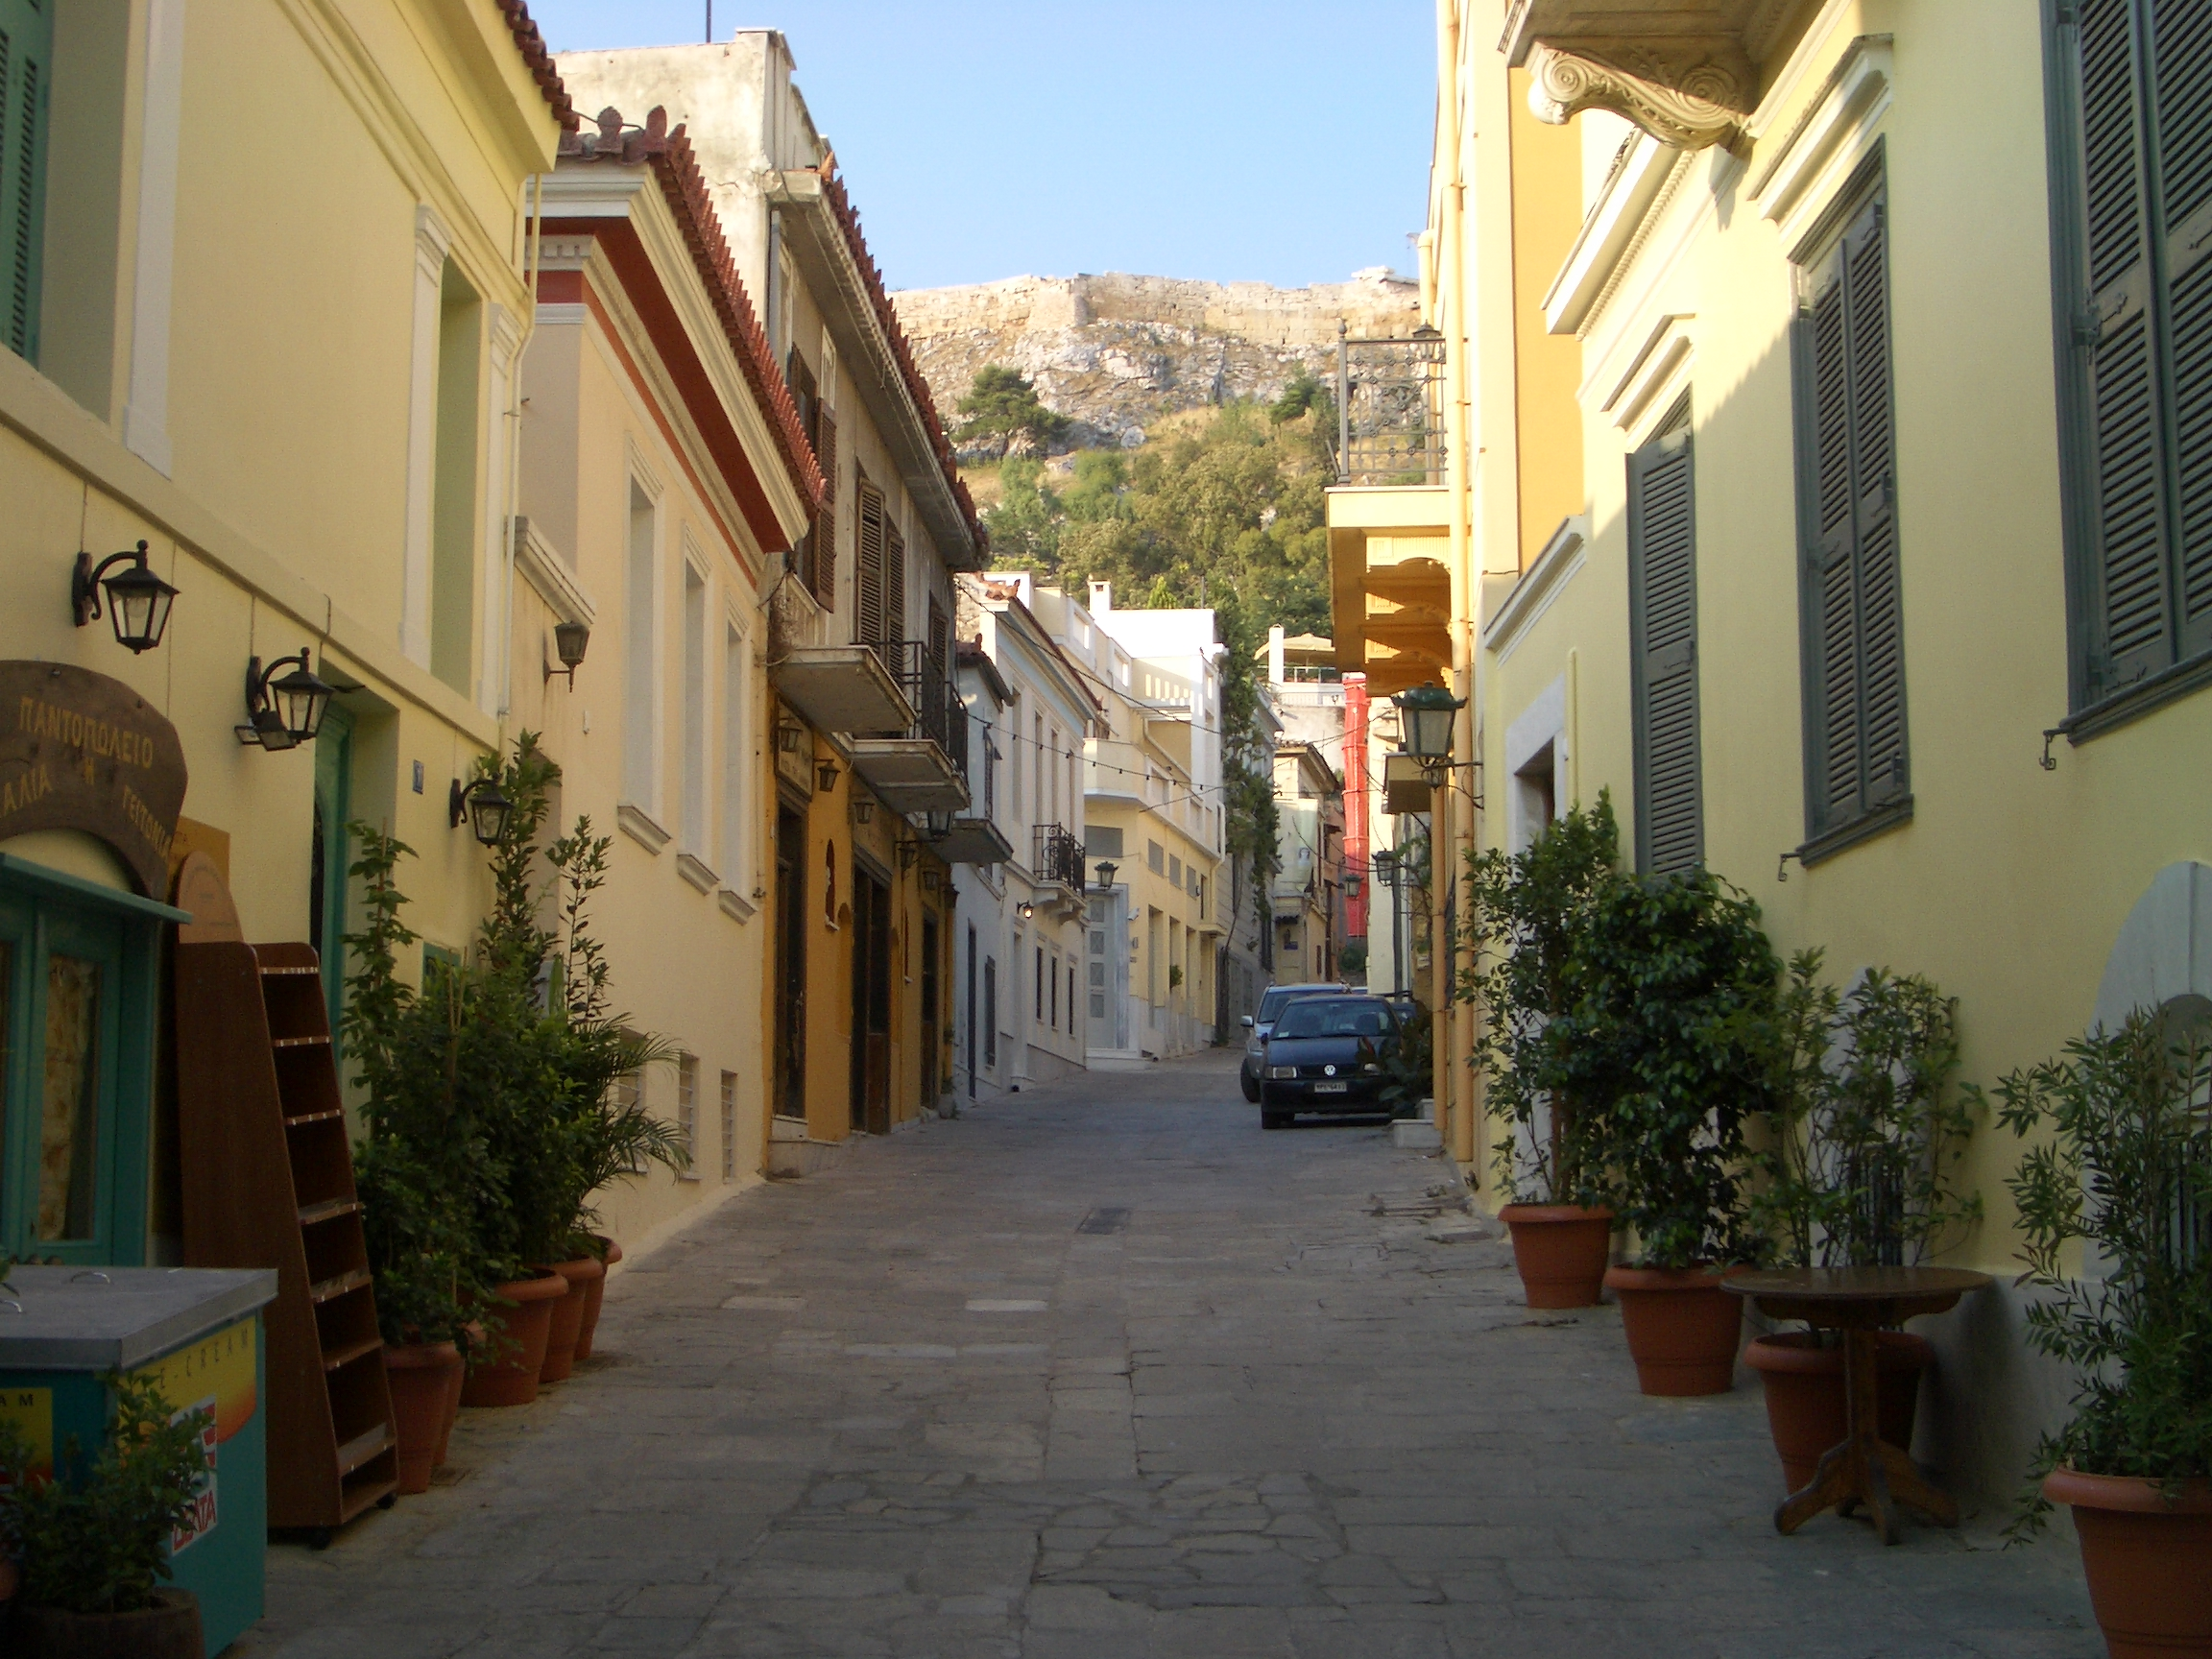 File:Athens Plaka07.jpg - Wikimedia Commons